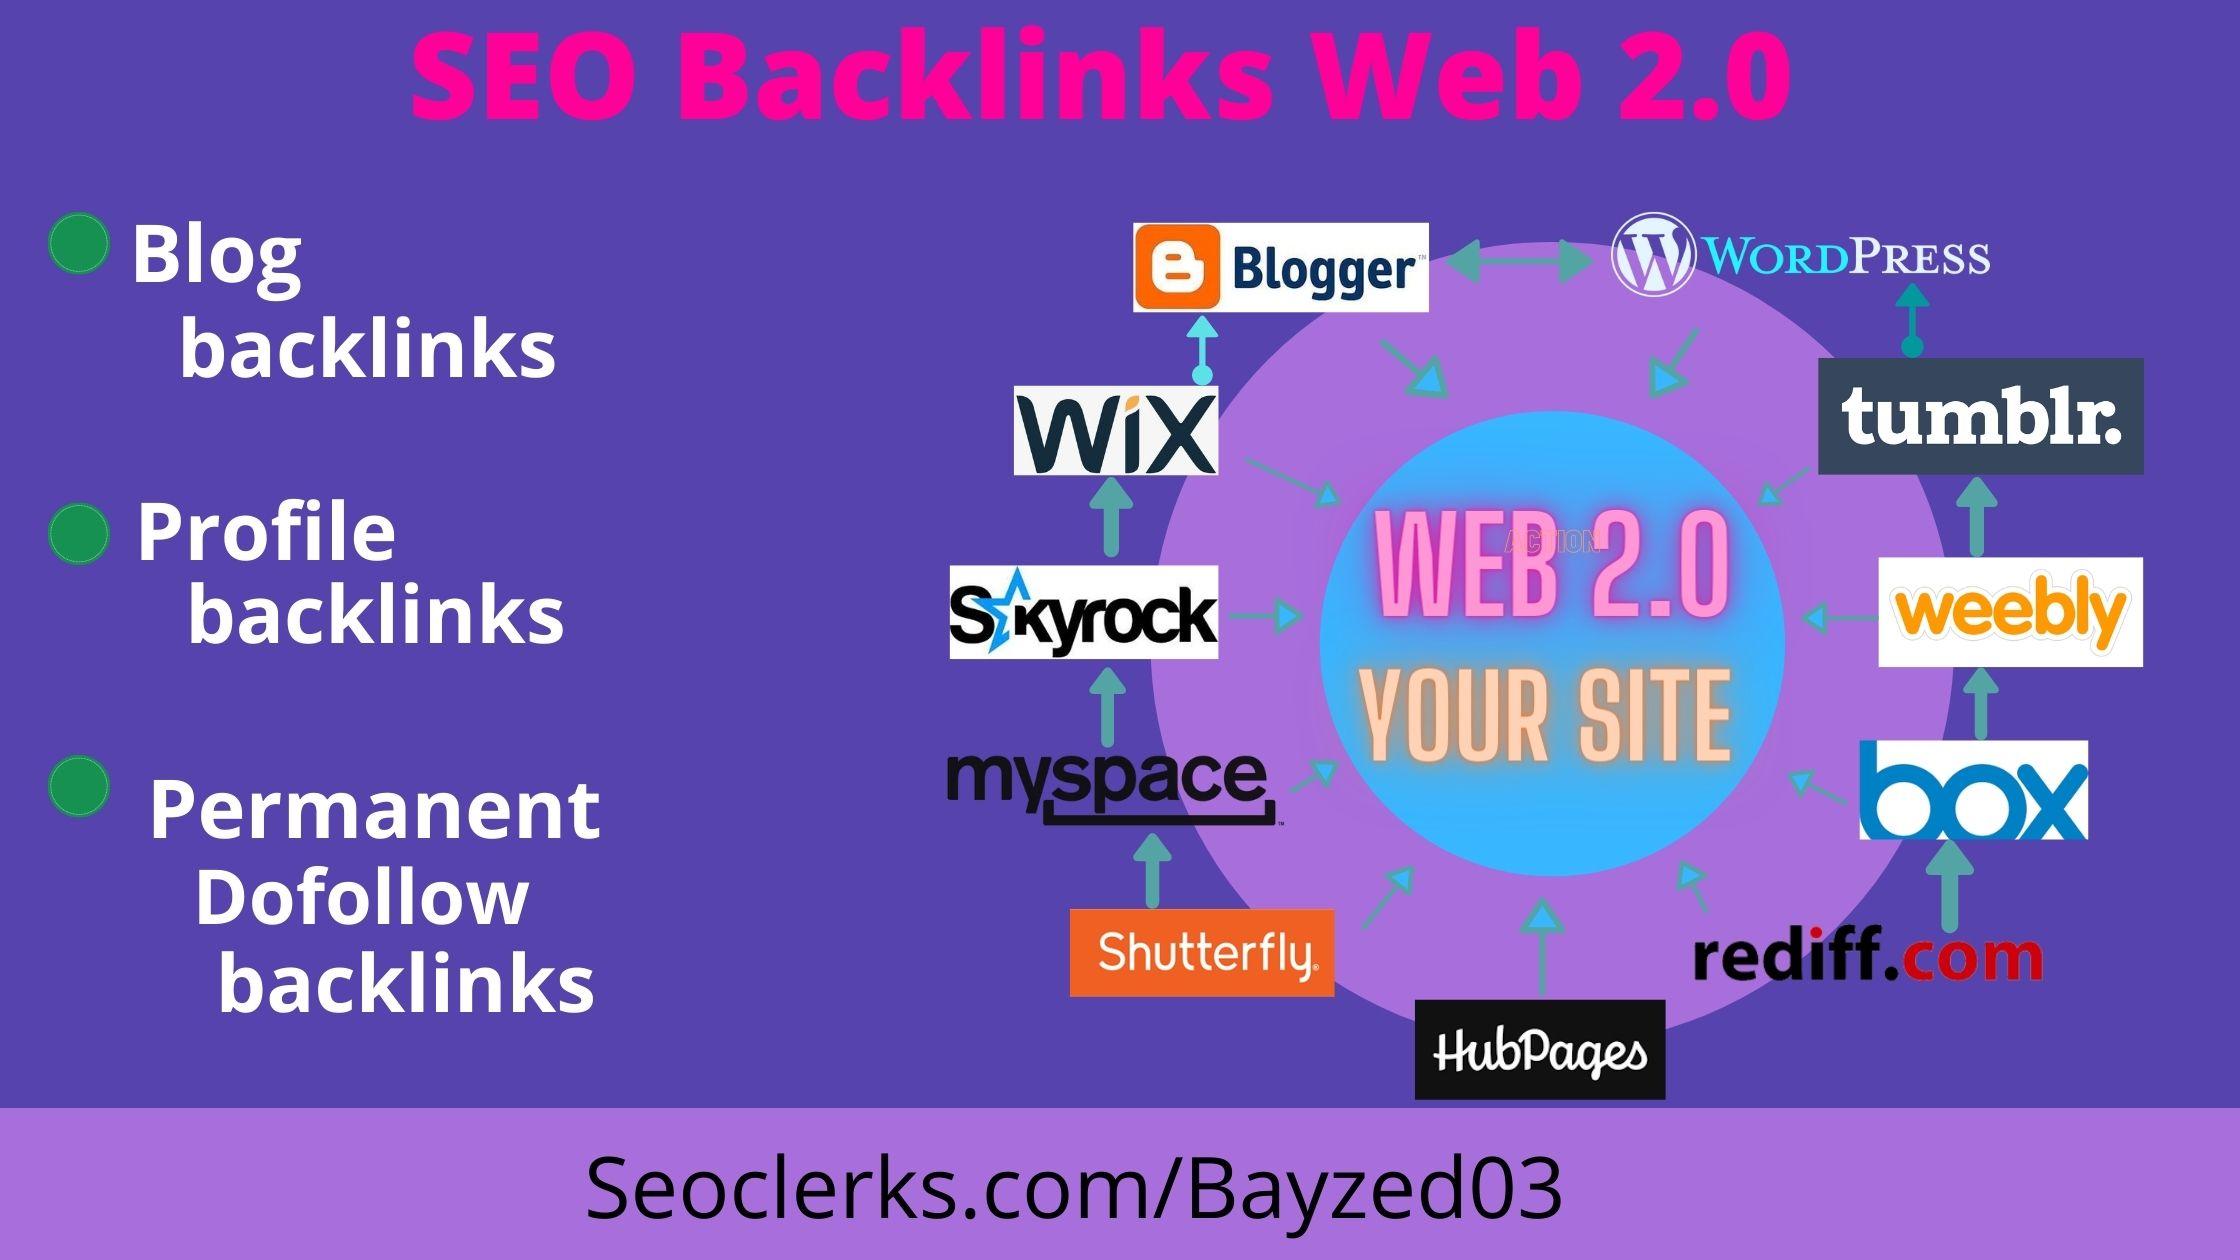 I will make 30 high authority web 2.0 backlinks